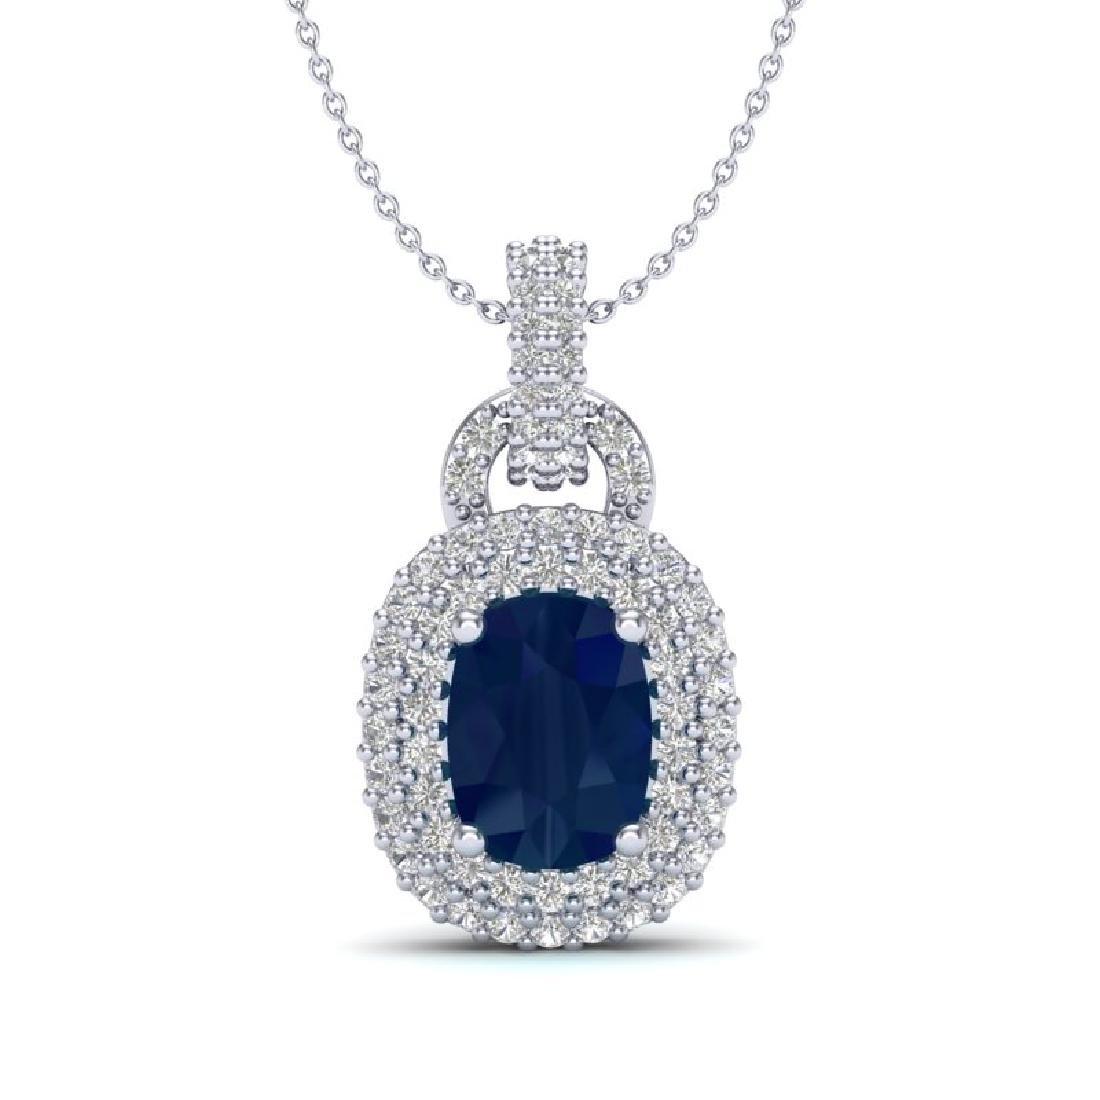 2.50 CTW Sapphire & Micro Pave VS/SI Diamond Necklace